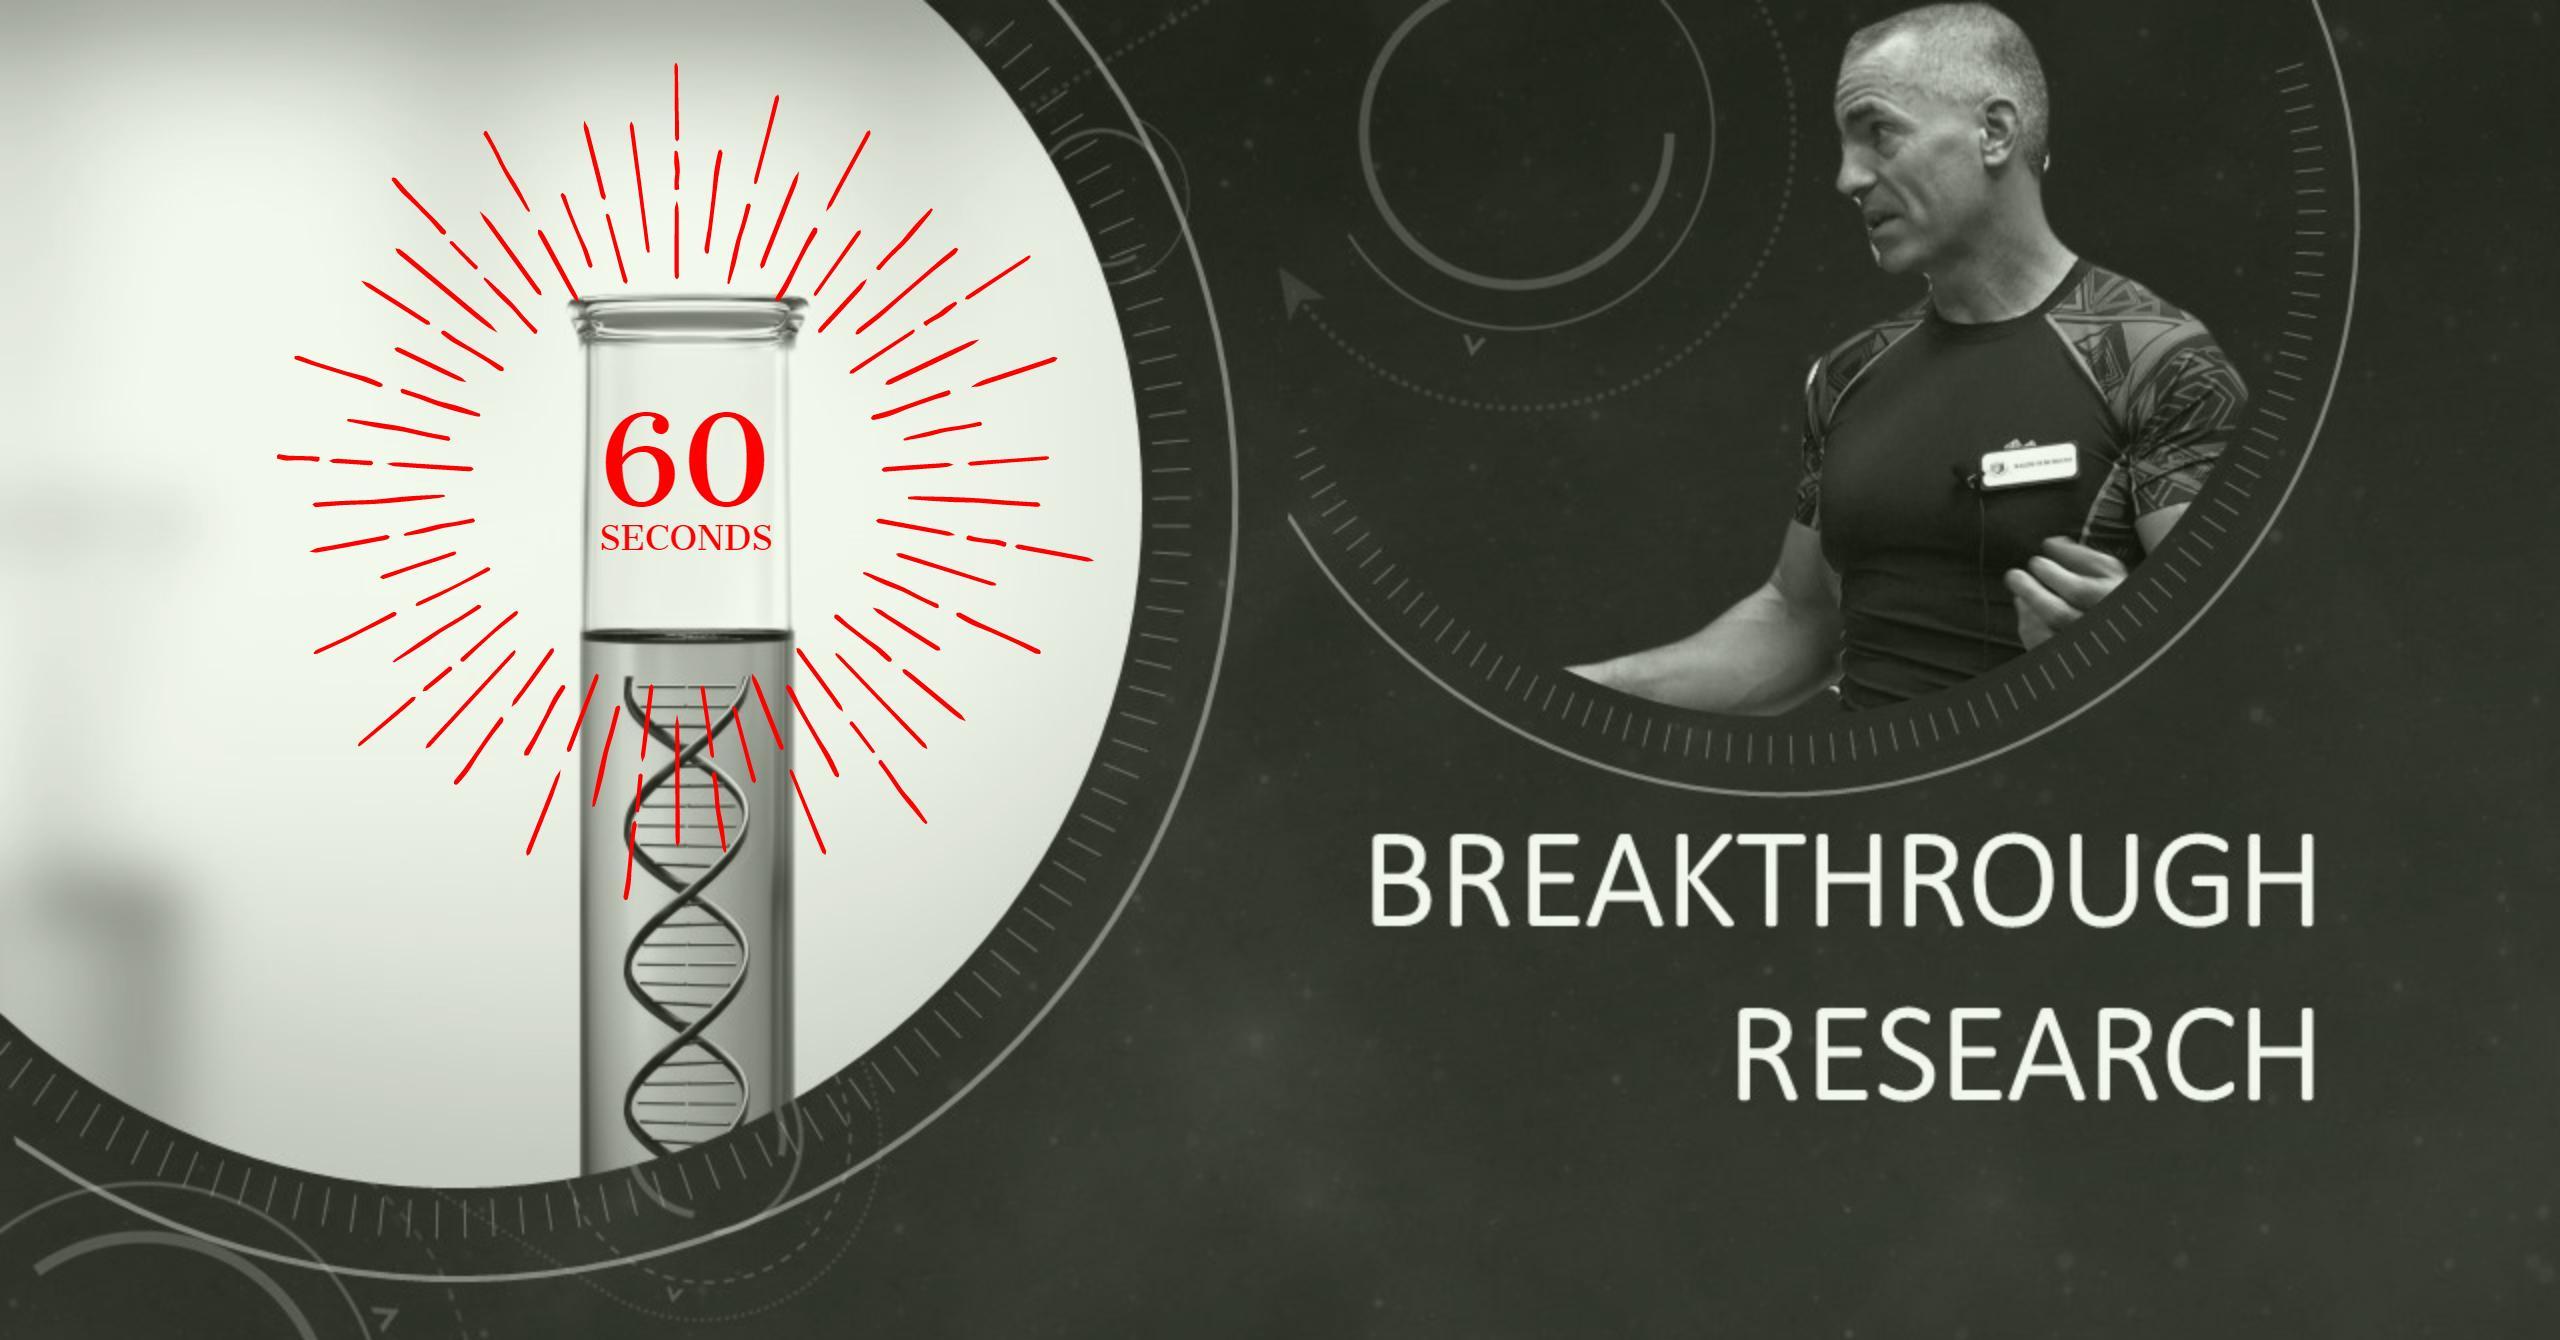 Research Breakthroughs 20 FEB 2017